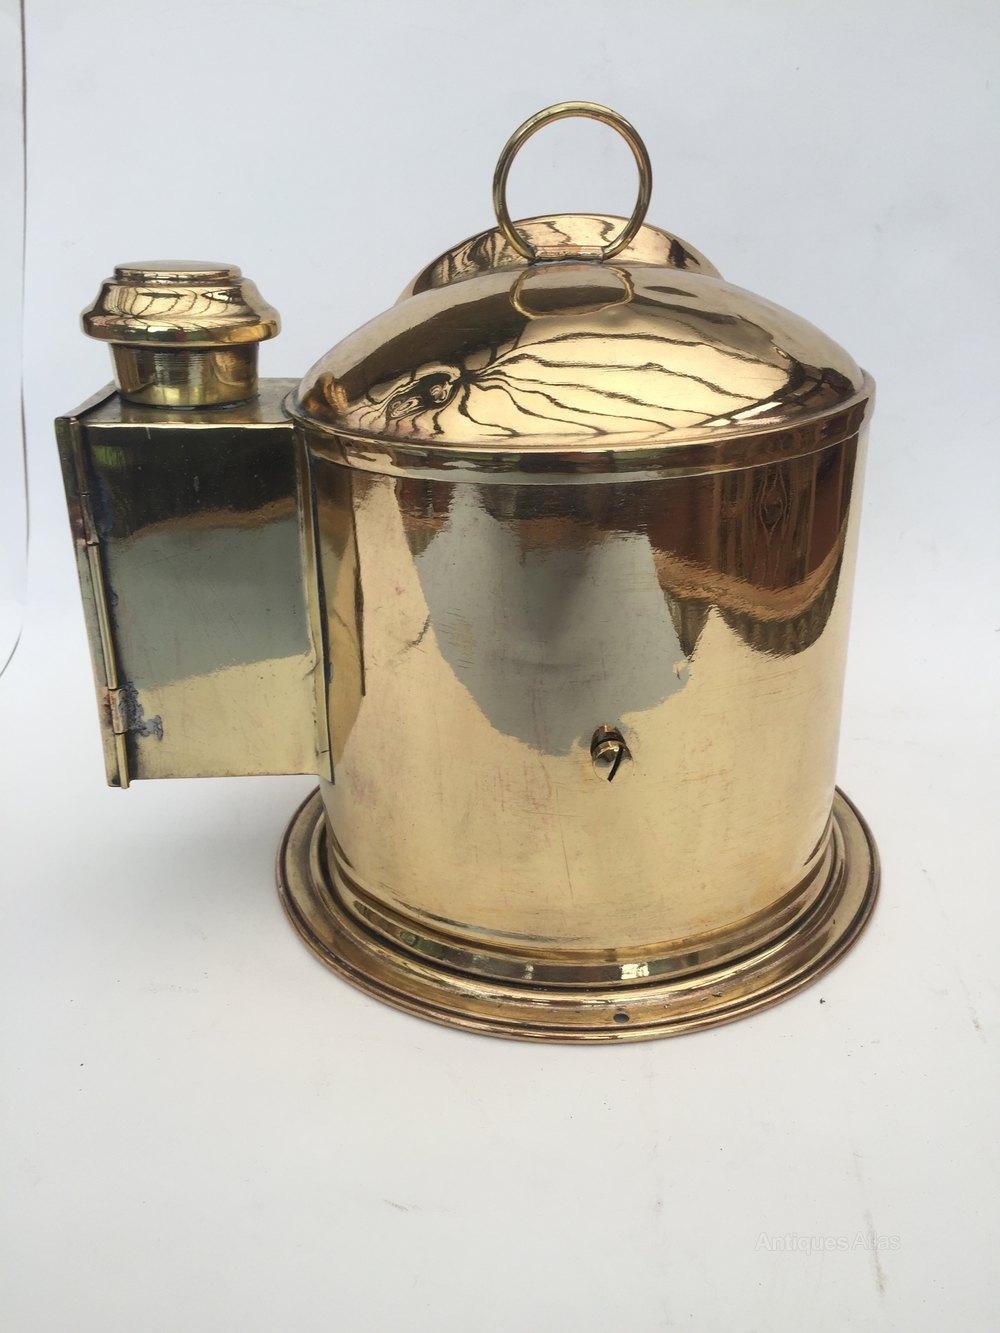 Stylish Antique brass maritime vintage binnacle compass